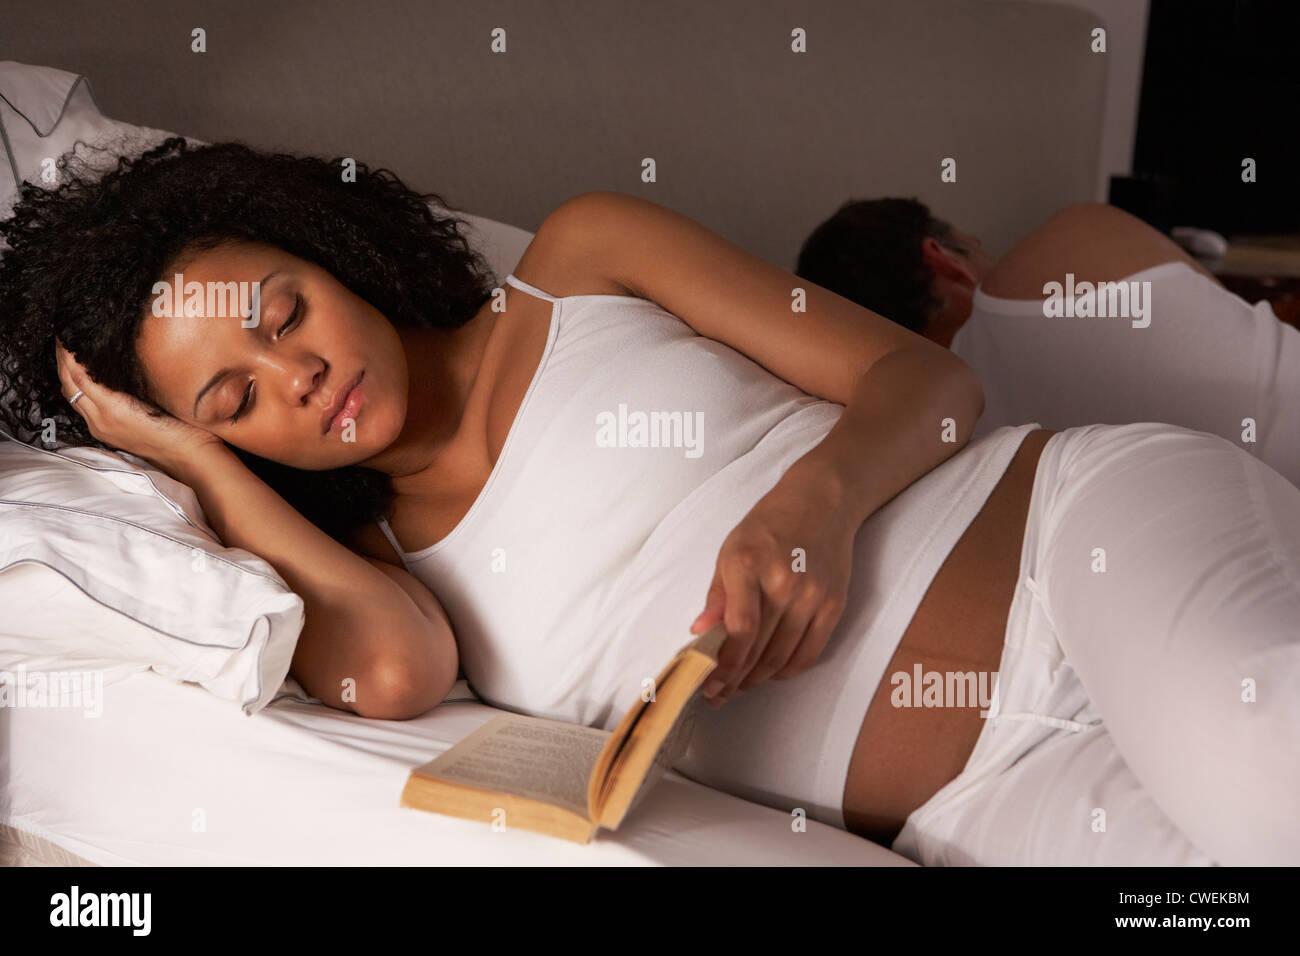 Pregnant woman unable to sleep - Stock Image